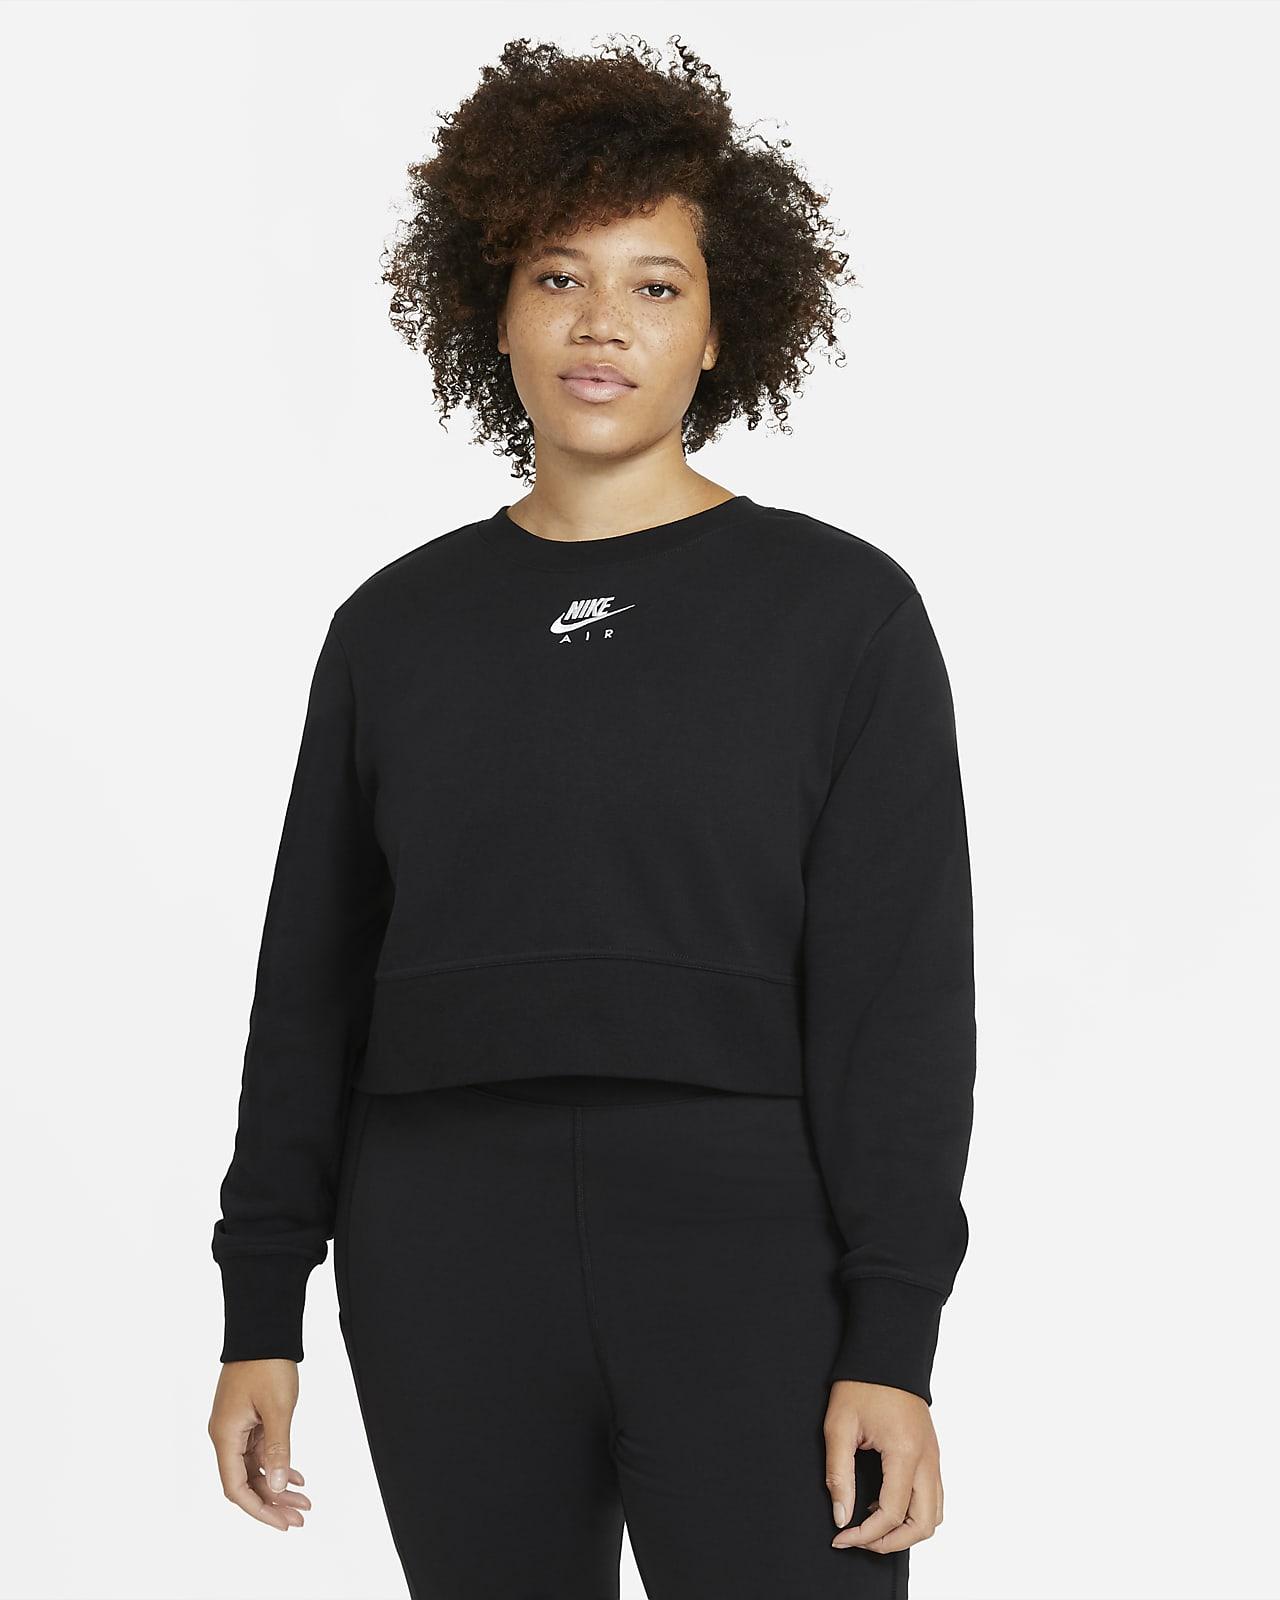 Bluza damska Nike Air (duże rozmiary)